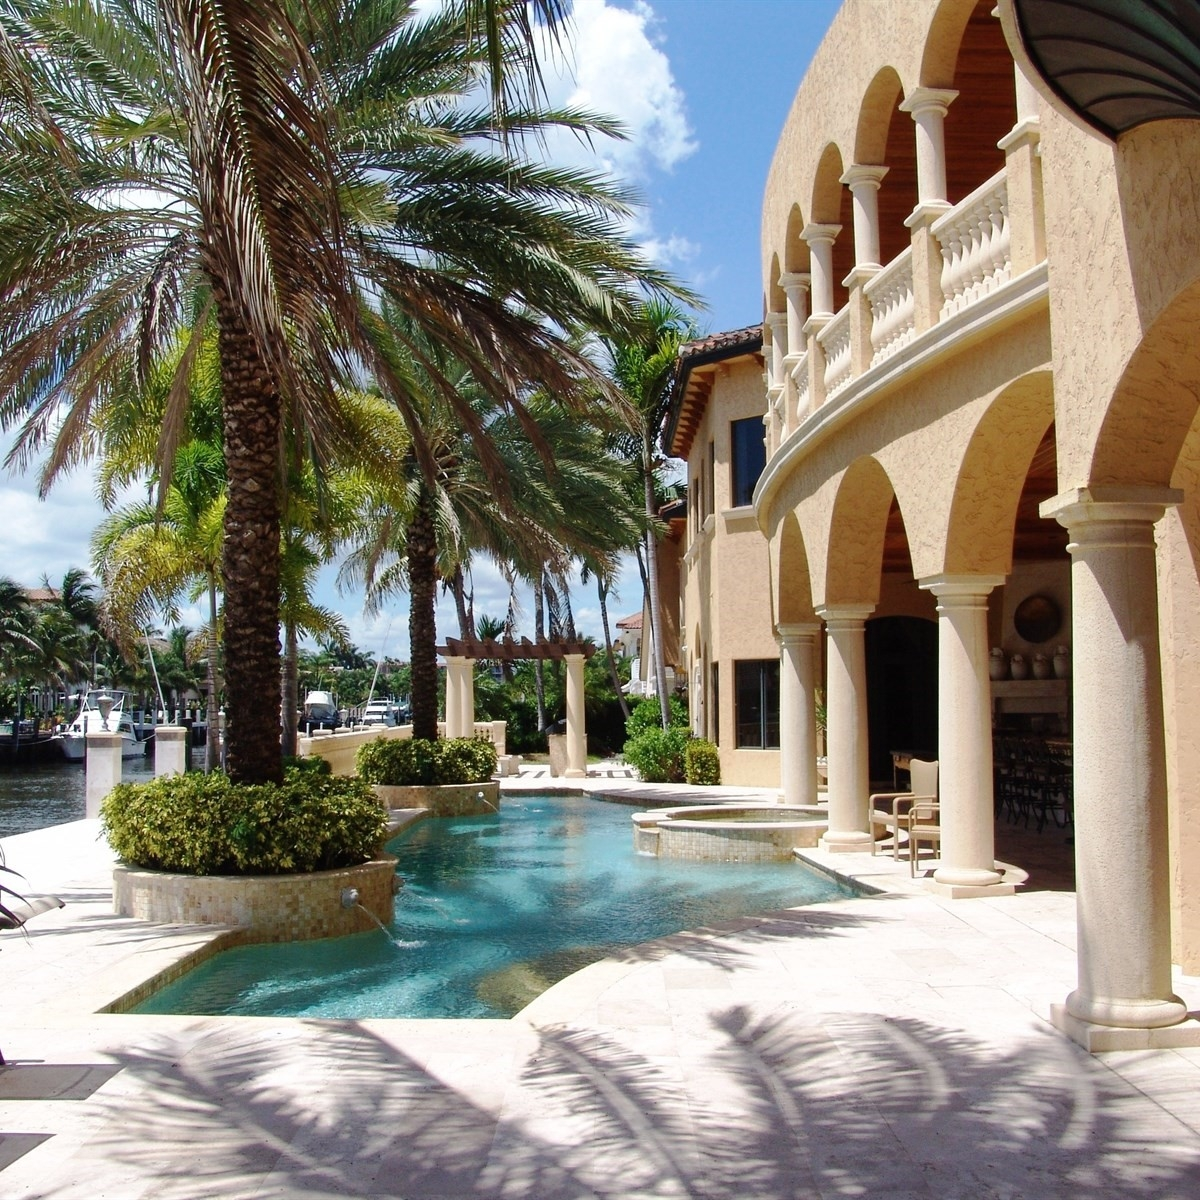 florida_architecture_backyard_oceanfront_pool_villa_luxury_mansion.jpg